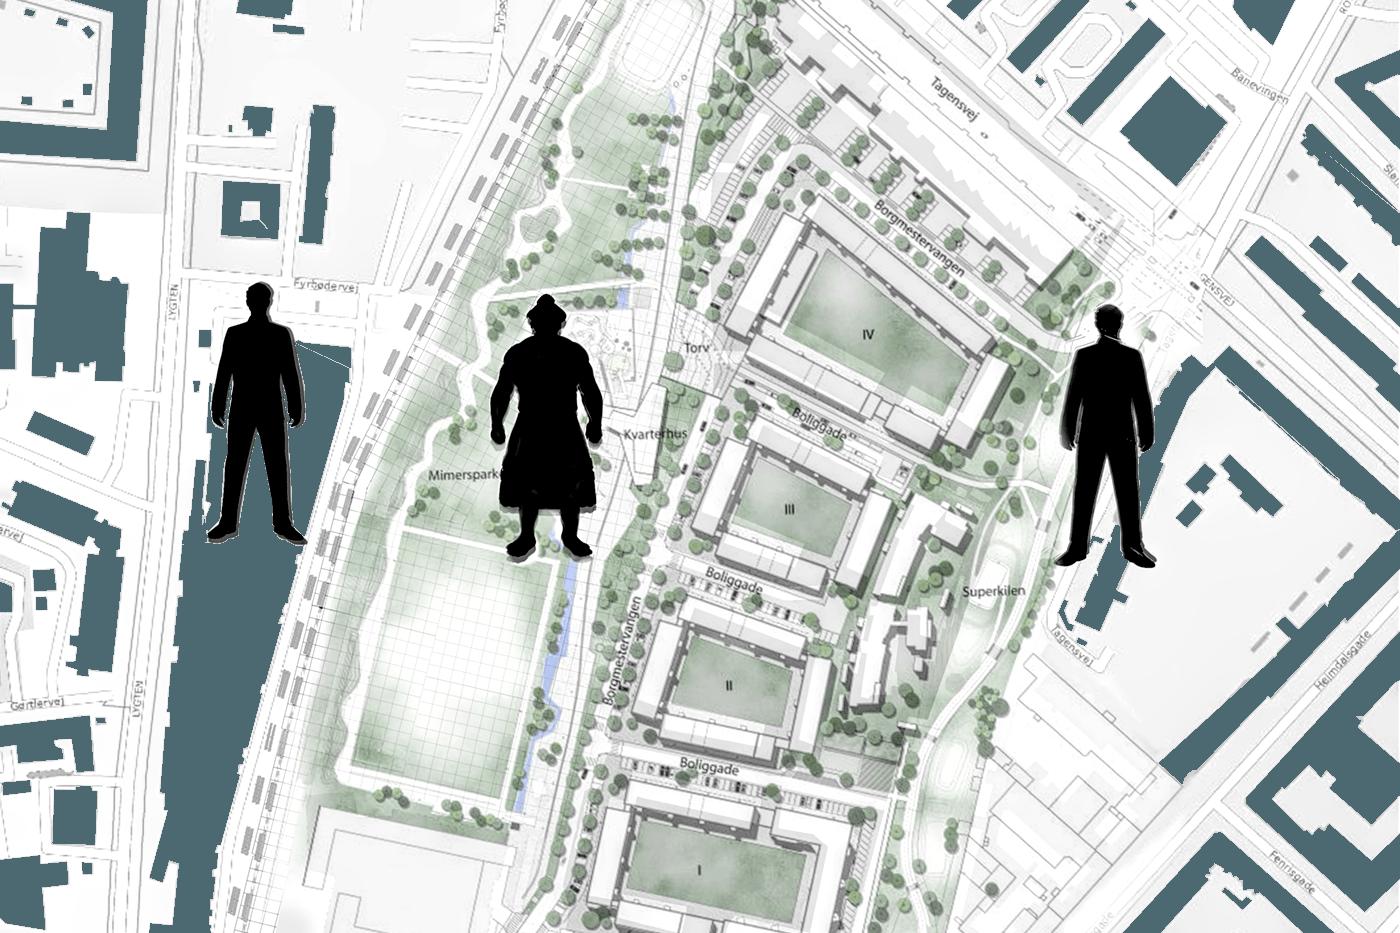 New urban plan of Mjølnerparken